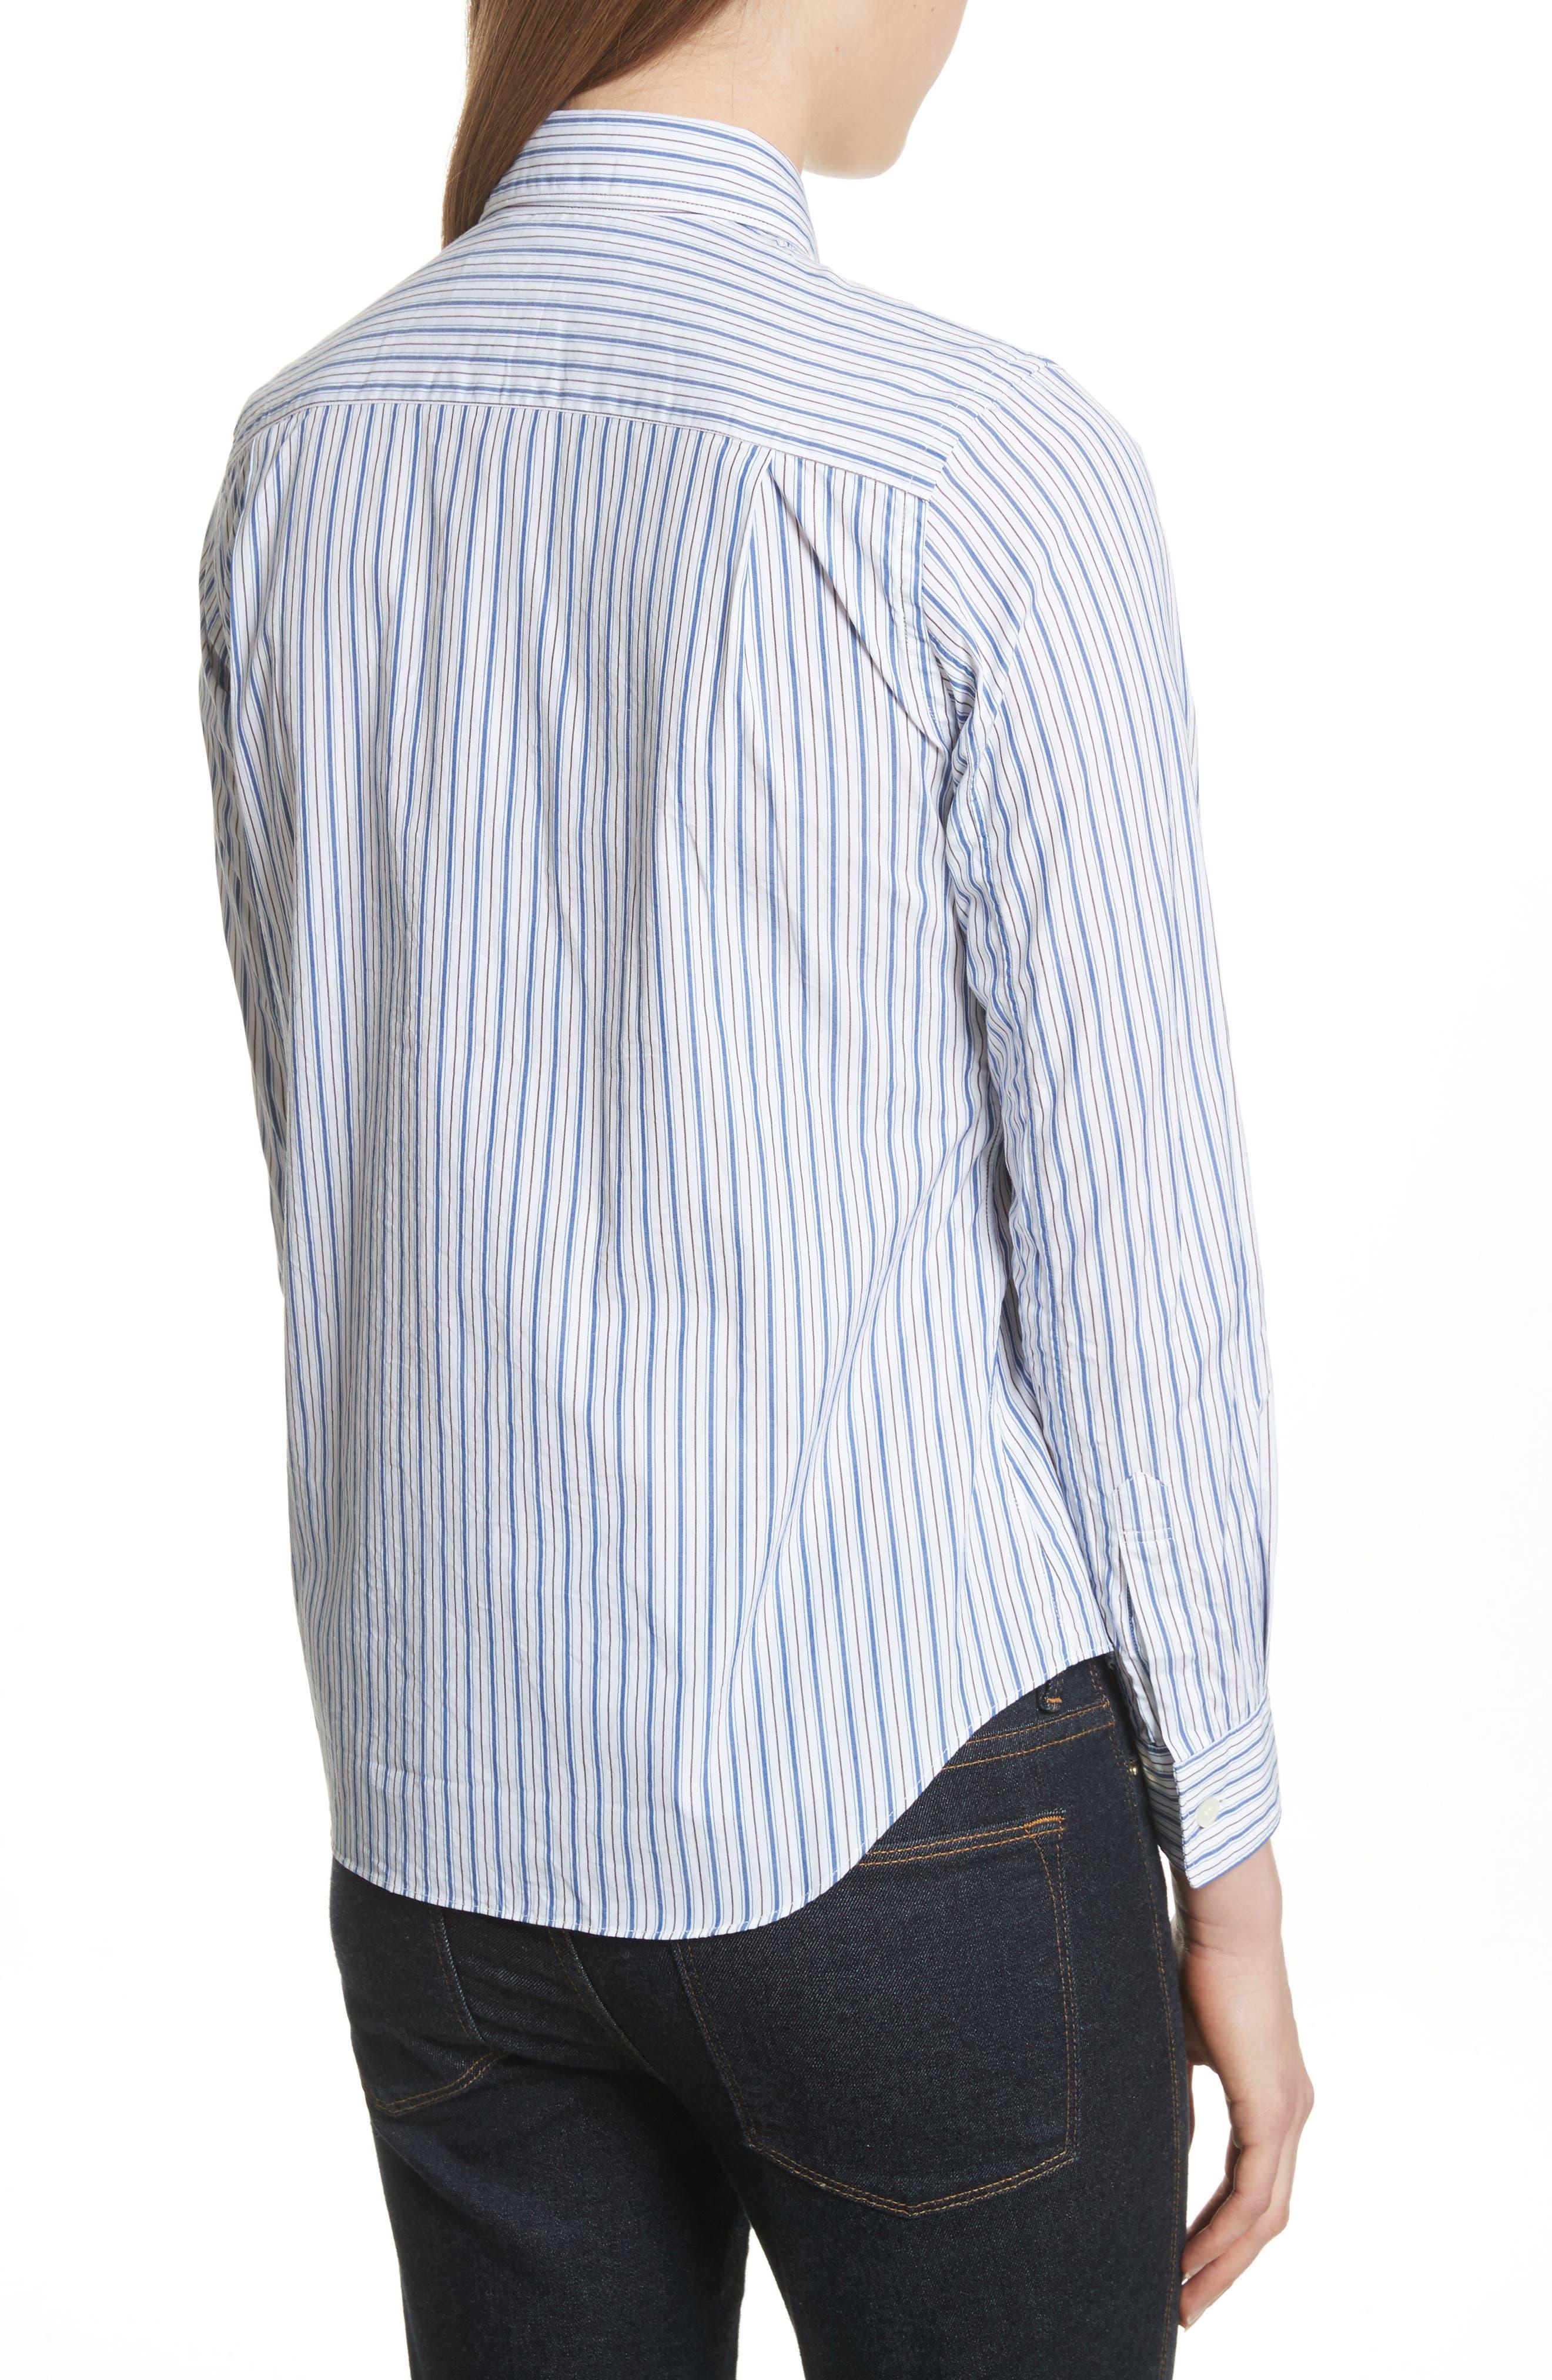 Stripe Shirt,                             Alternate thumbnail 2, color,                             BLUE